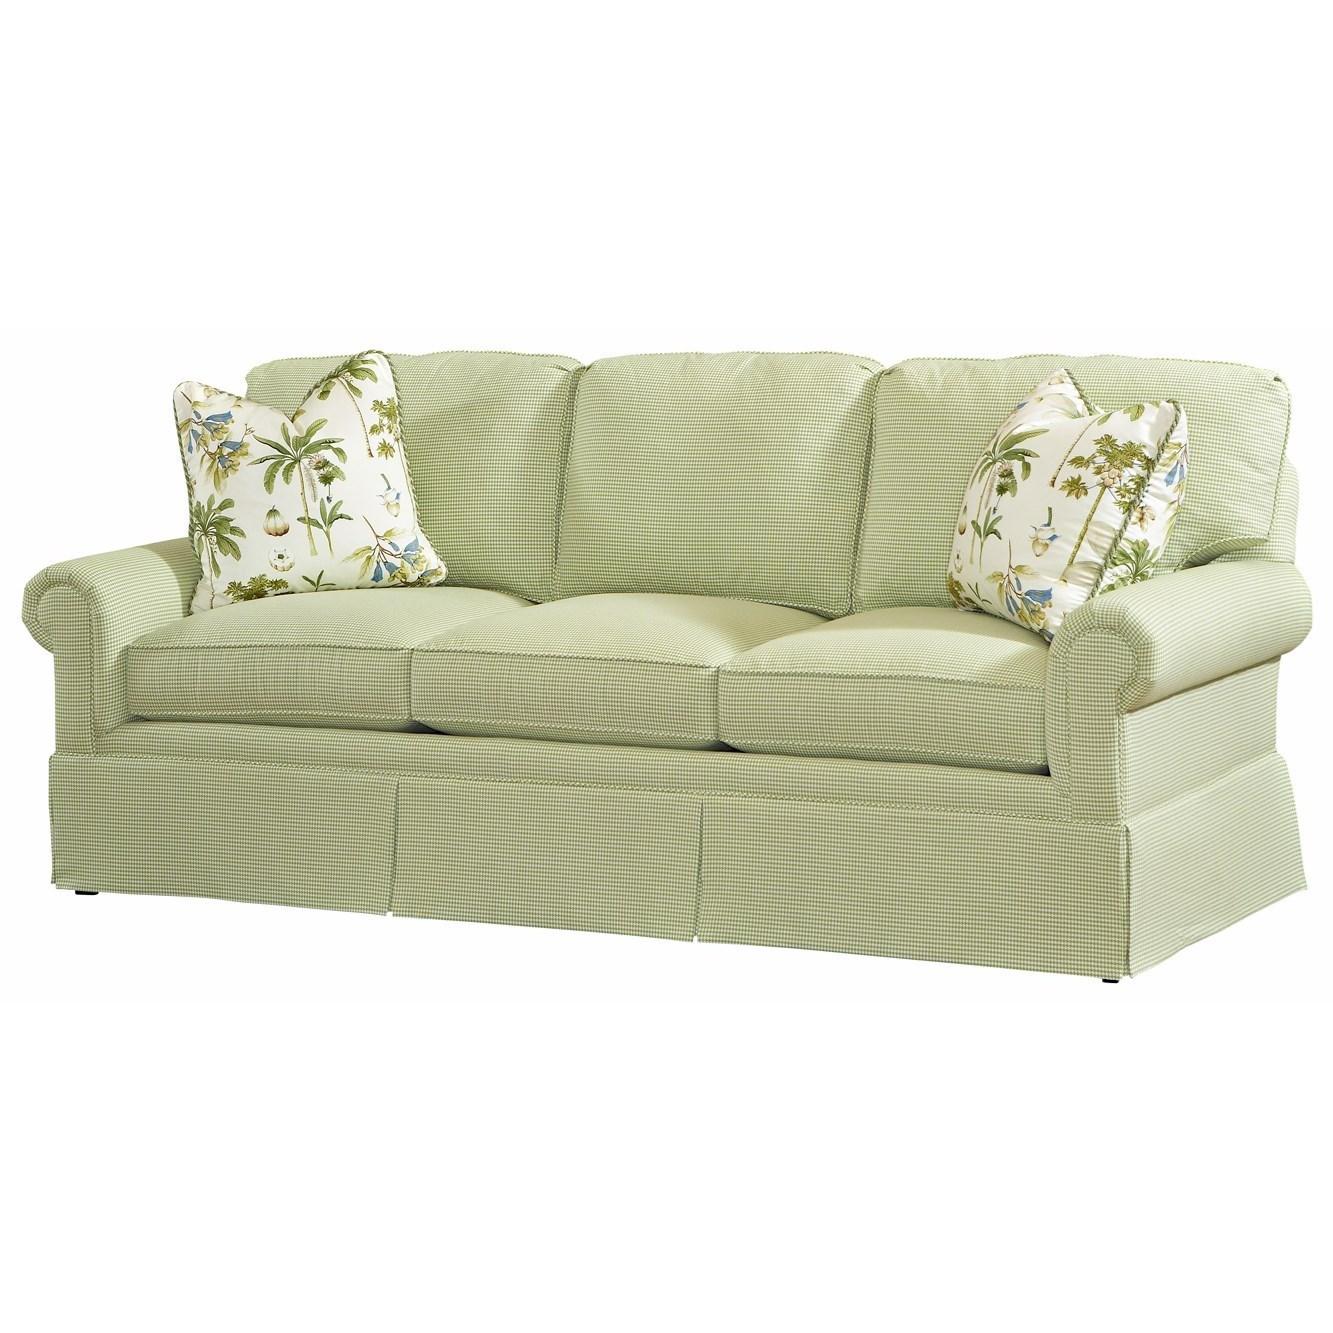 Personal Design Series Customizable Bennett Sofa  by Lexington at Johnny Janosik